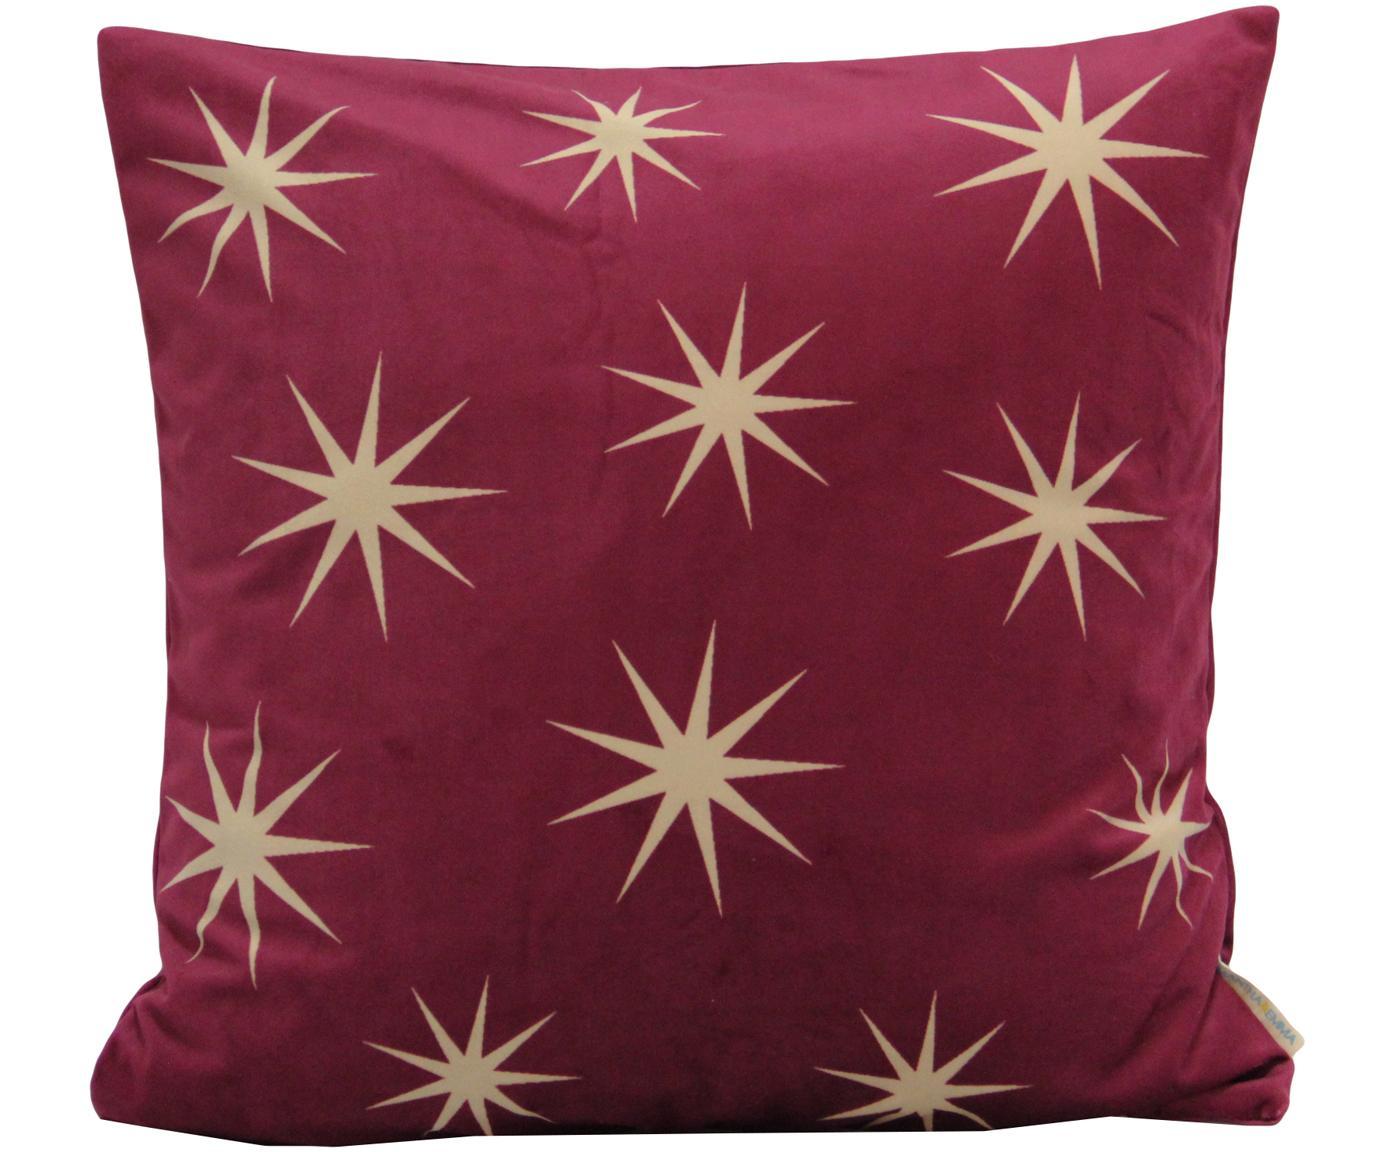 Samt-Kissenhülle Stars mit goldenem Sternen Print, Polyestersamt, Rot, Beige, 45 x 45 cm